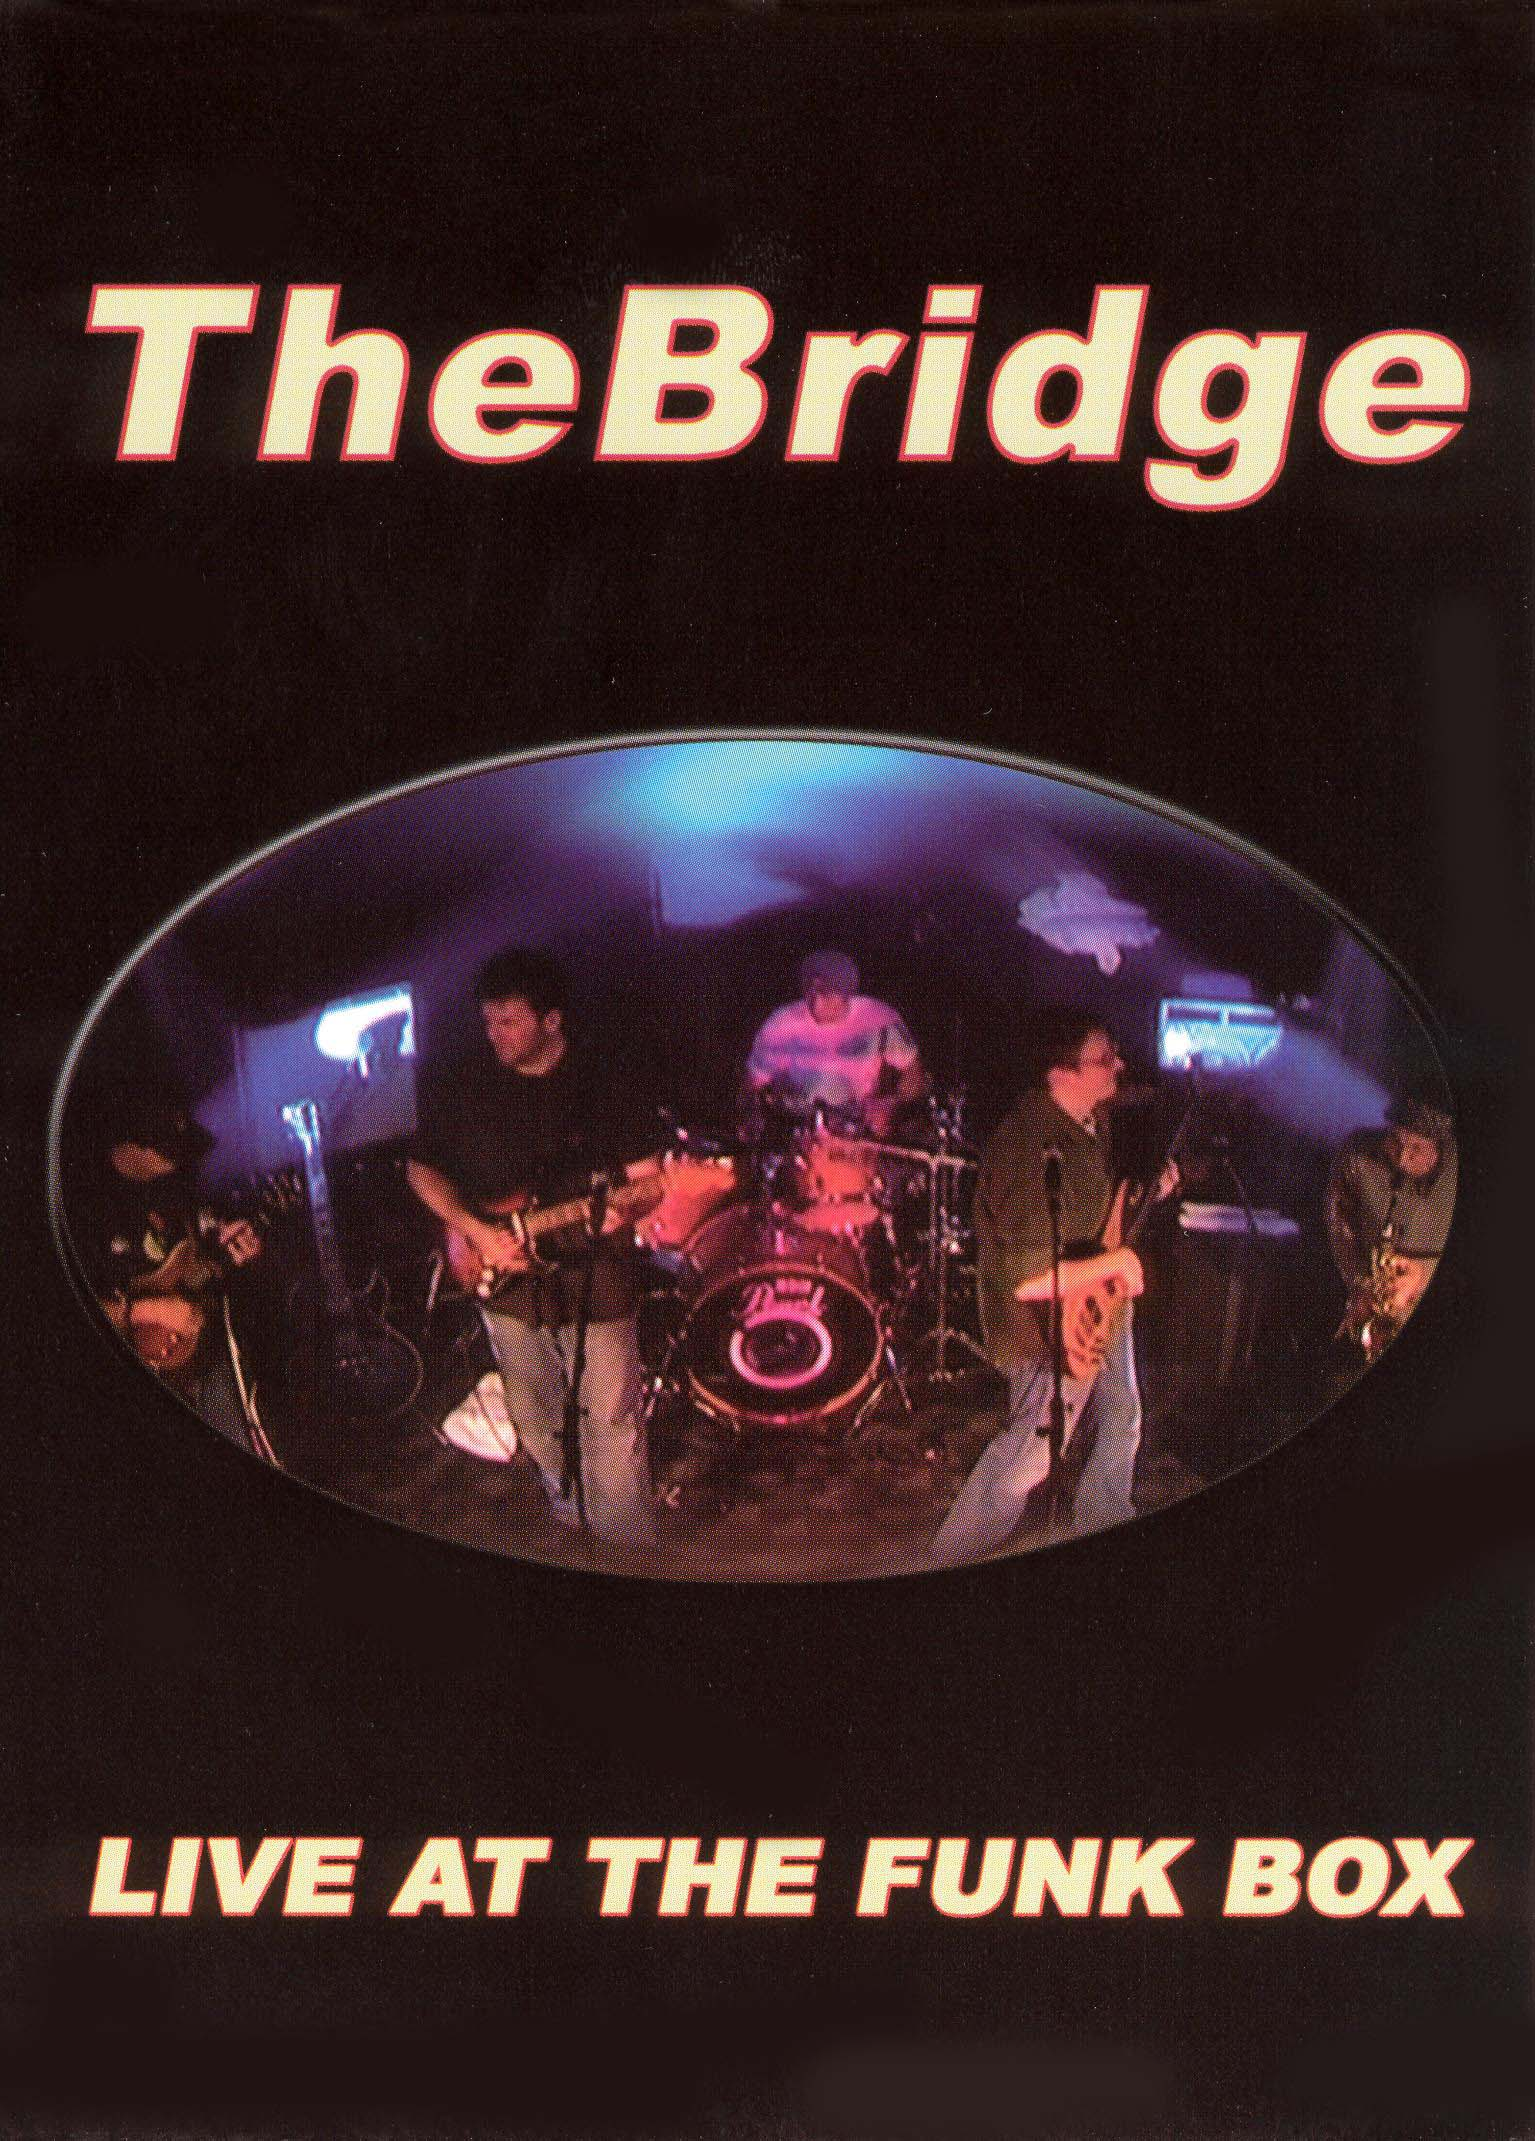 The Bridge: Live At the Funk Box